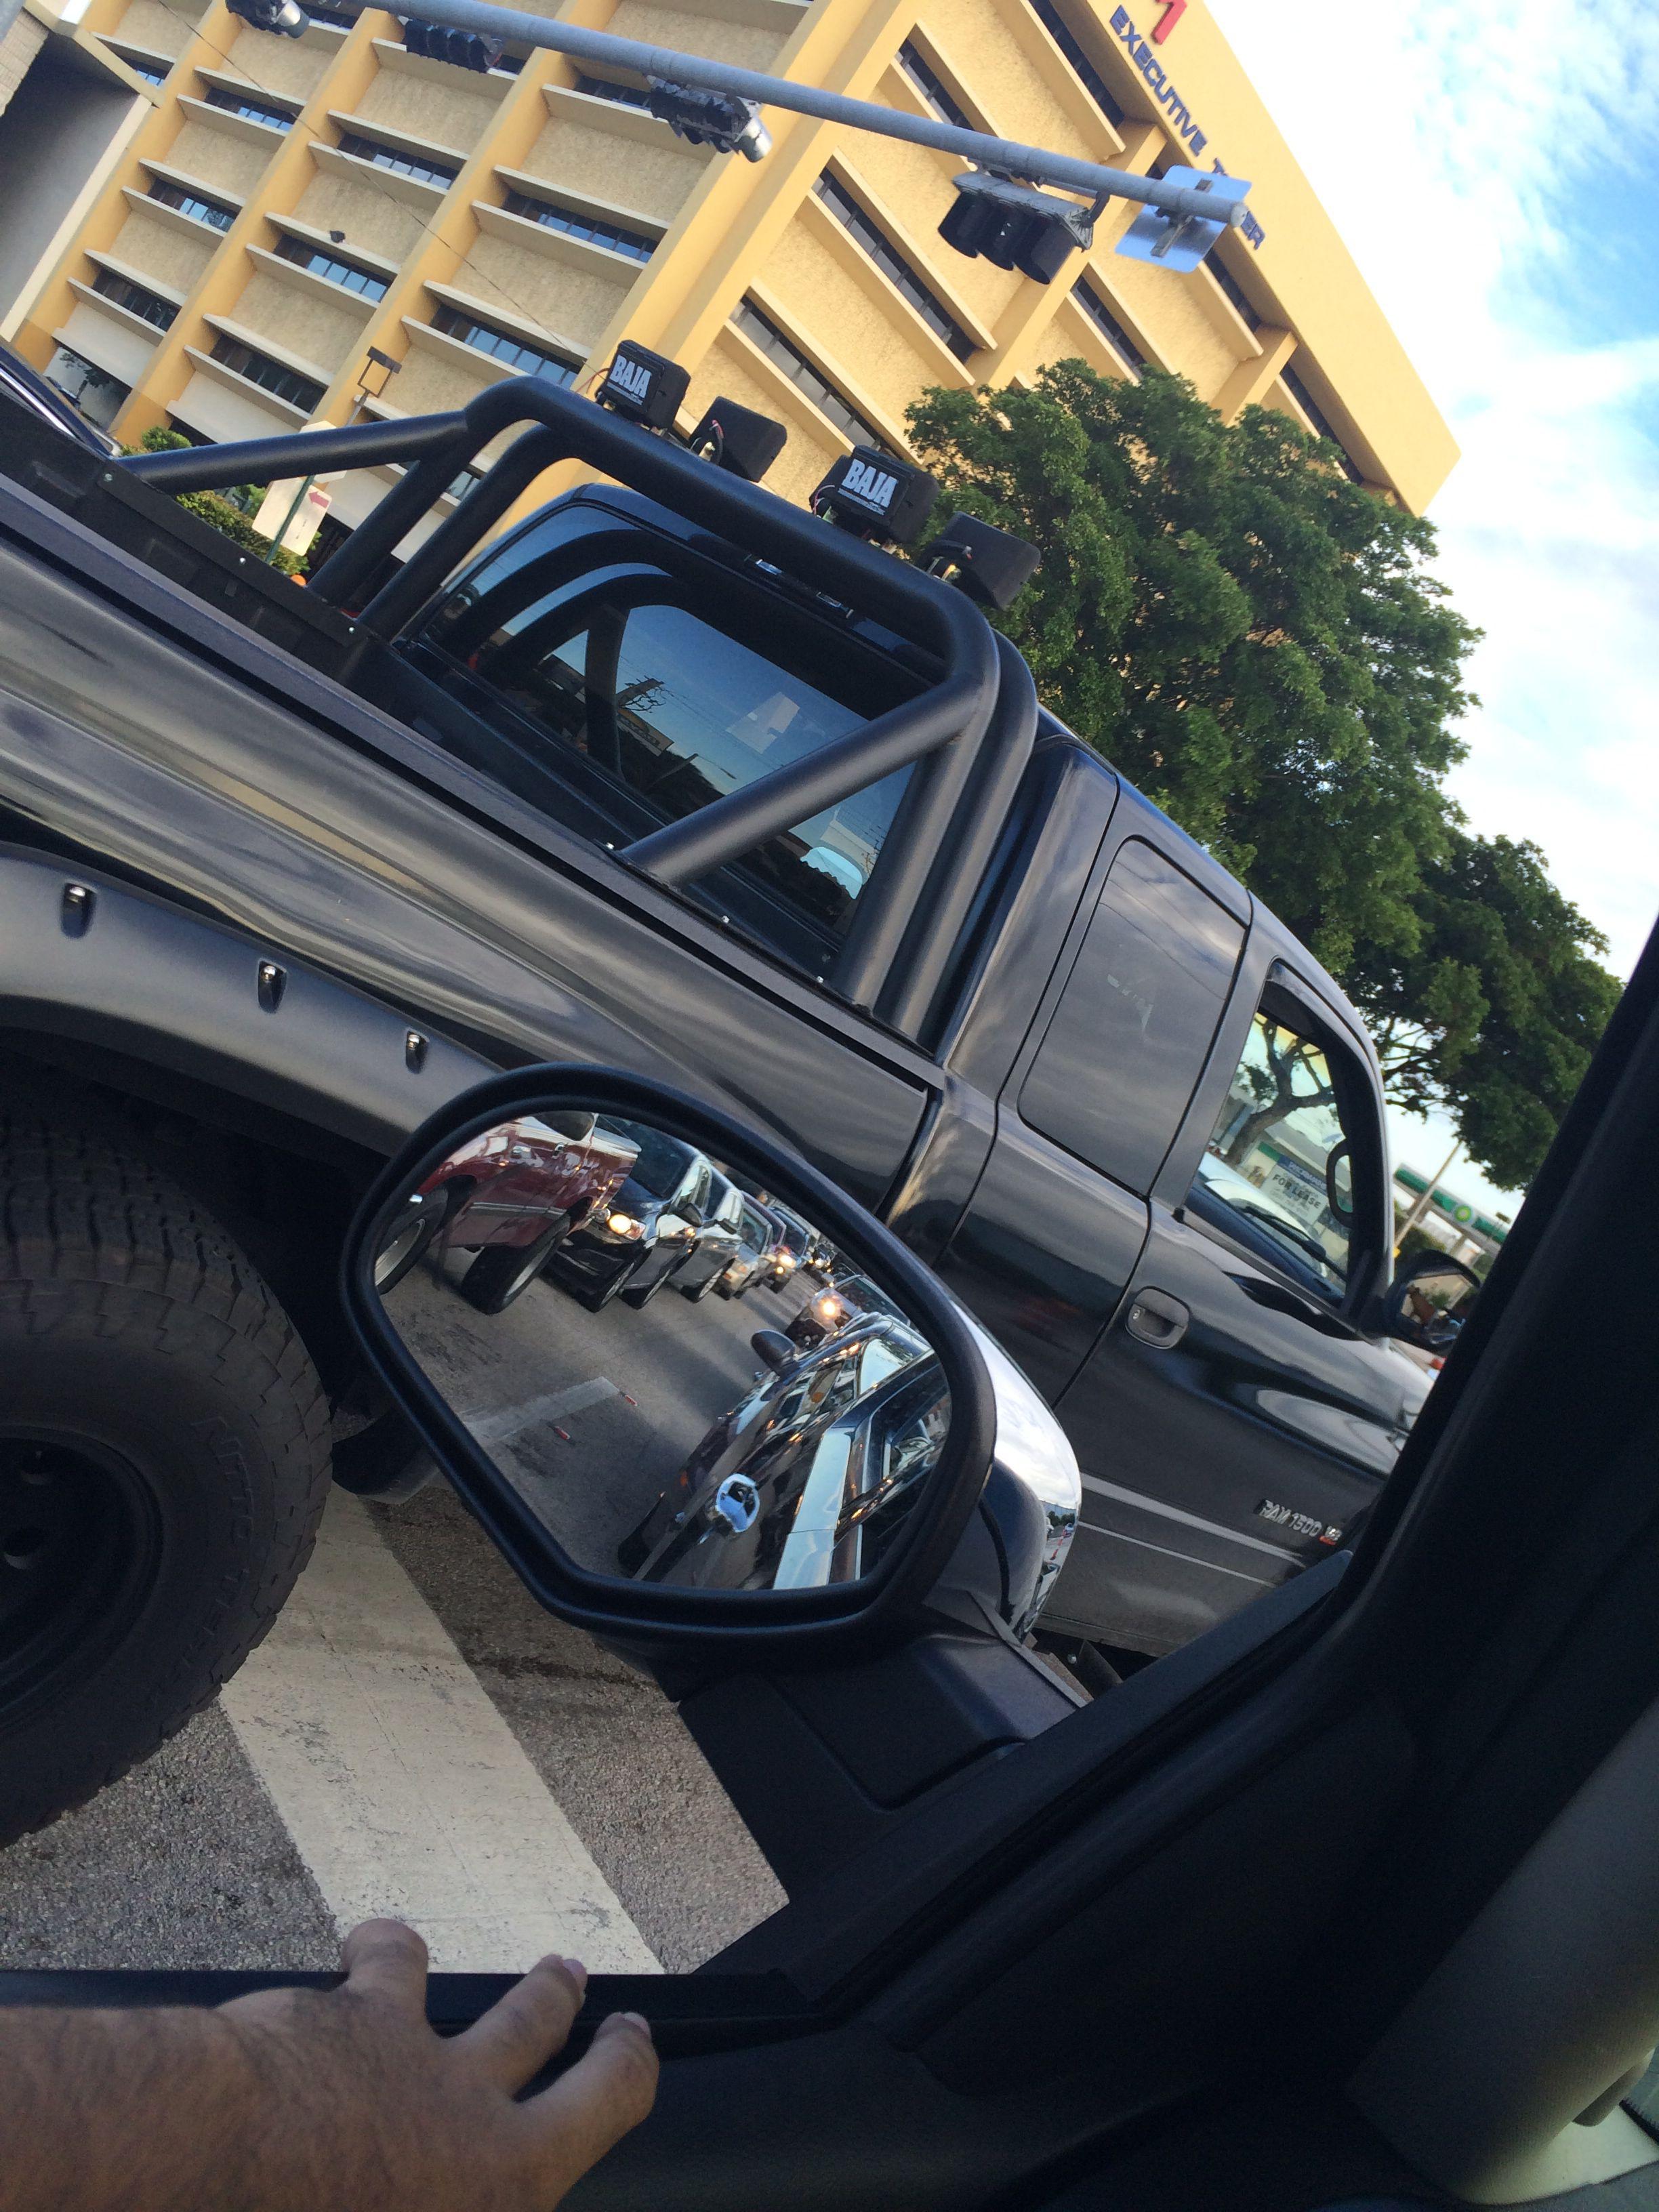 Dodge Ram Roll Bar : dodge, Truck, Considering, Getting, That's, Back., #trucks, #lifted, #dodge, 1500,, Dodge, Dakota,